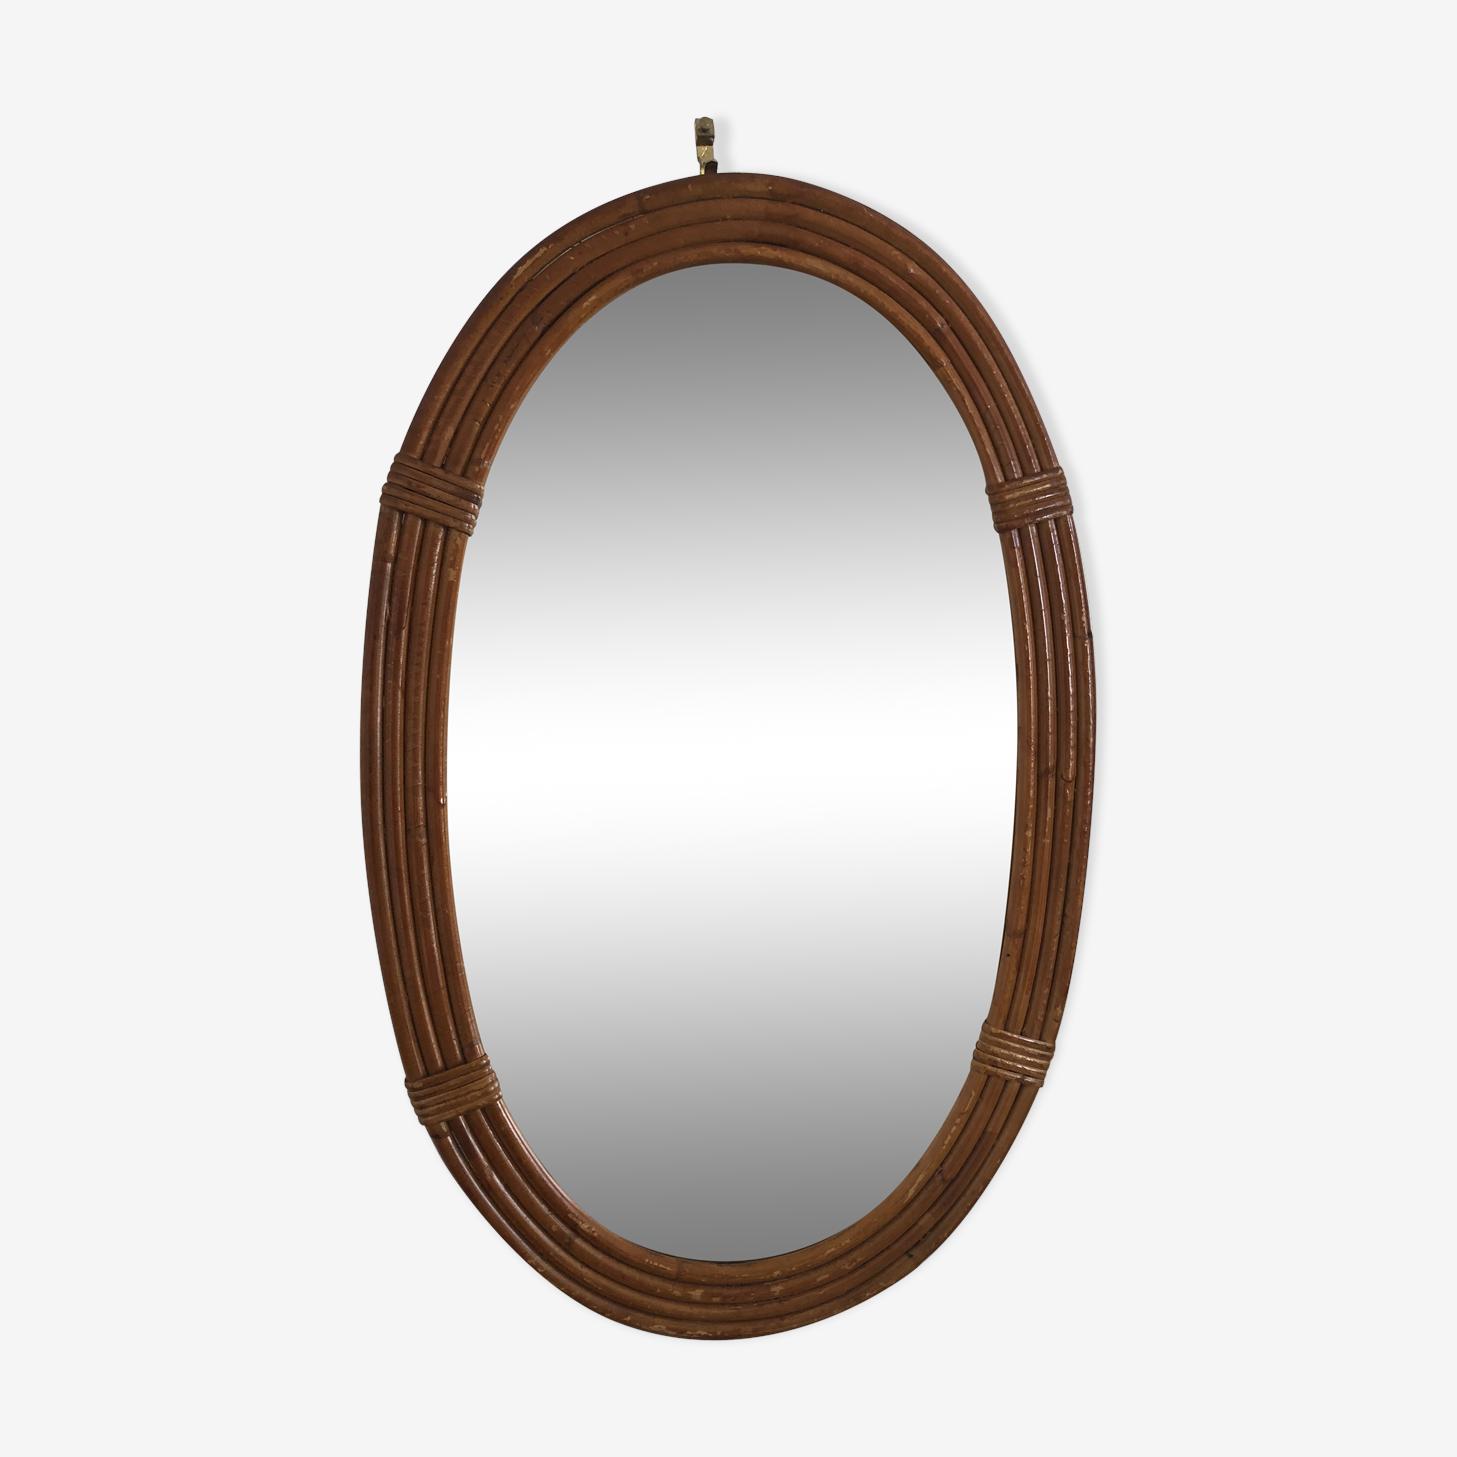 Rattan oval mirror